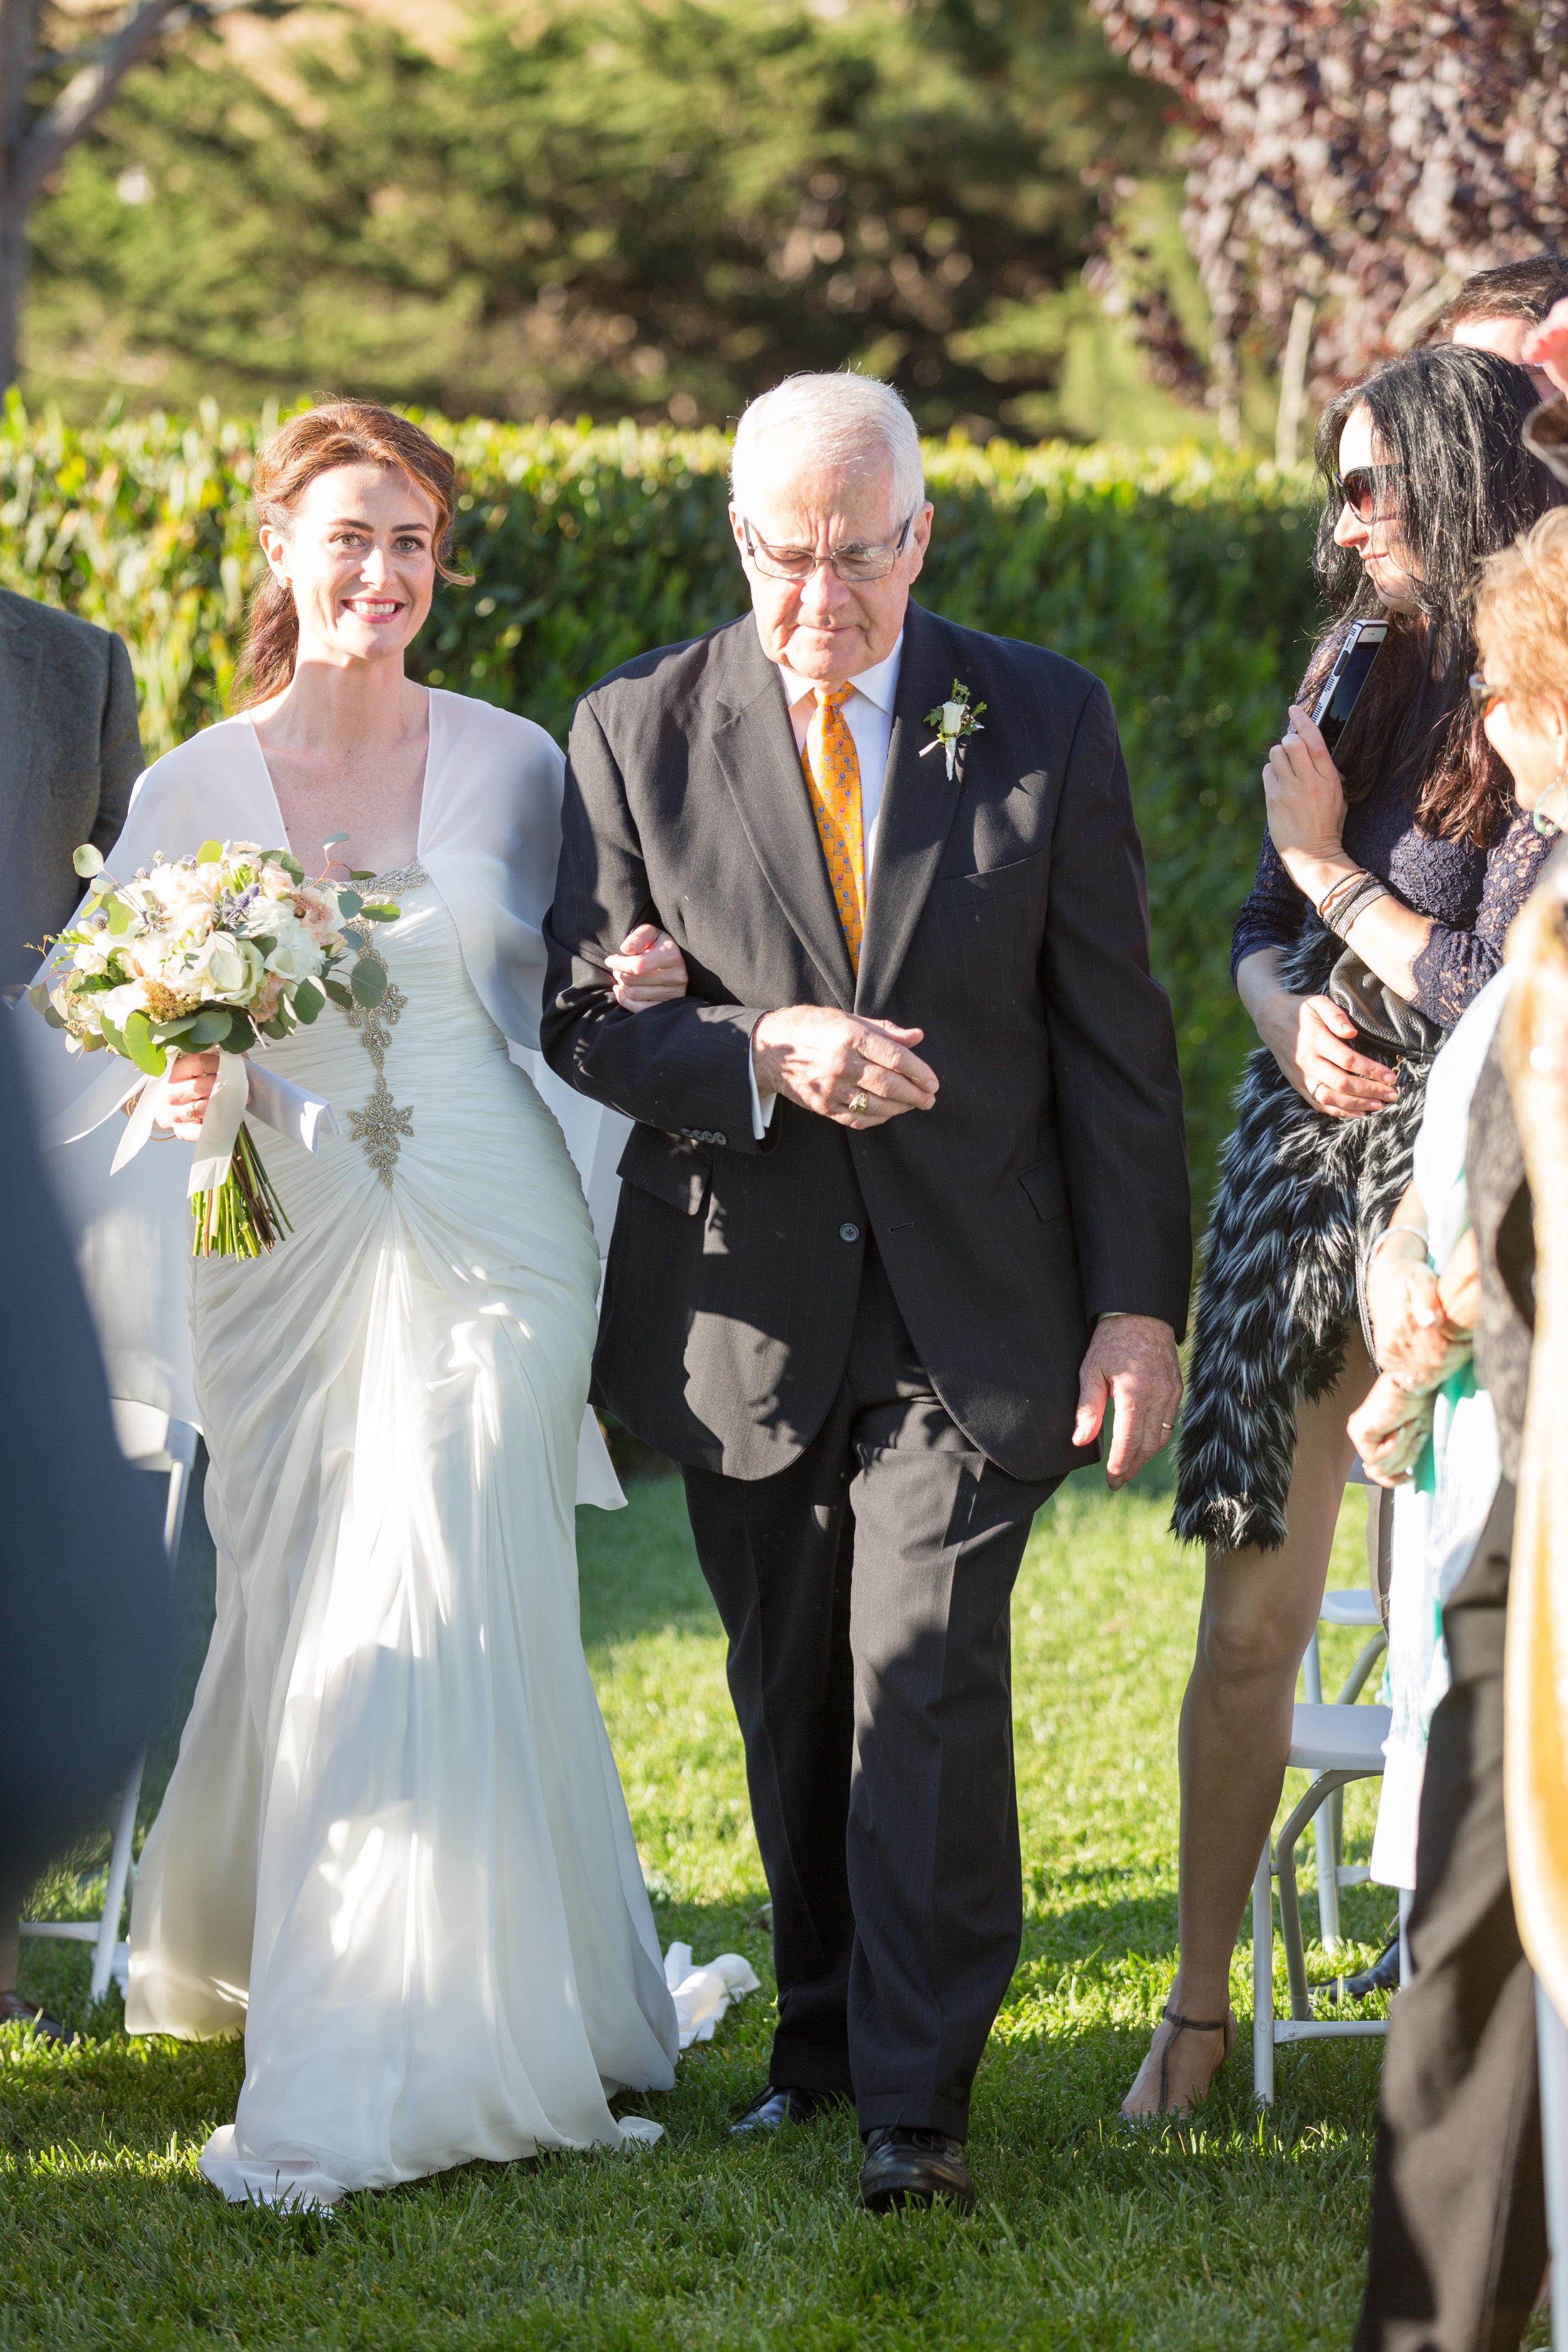 Muir-Beach-Wedding-28.jpg